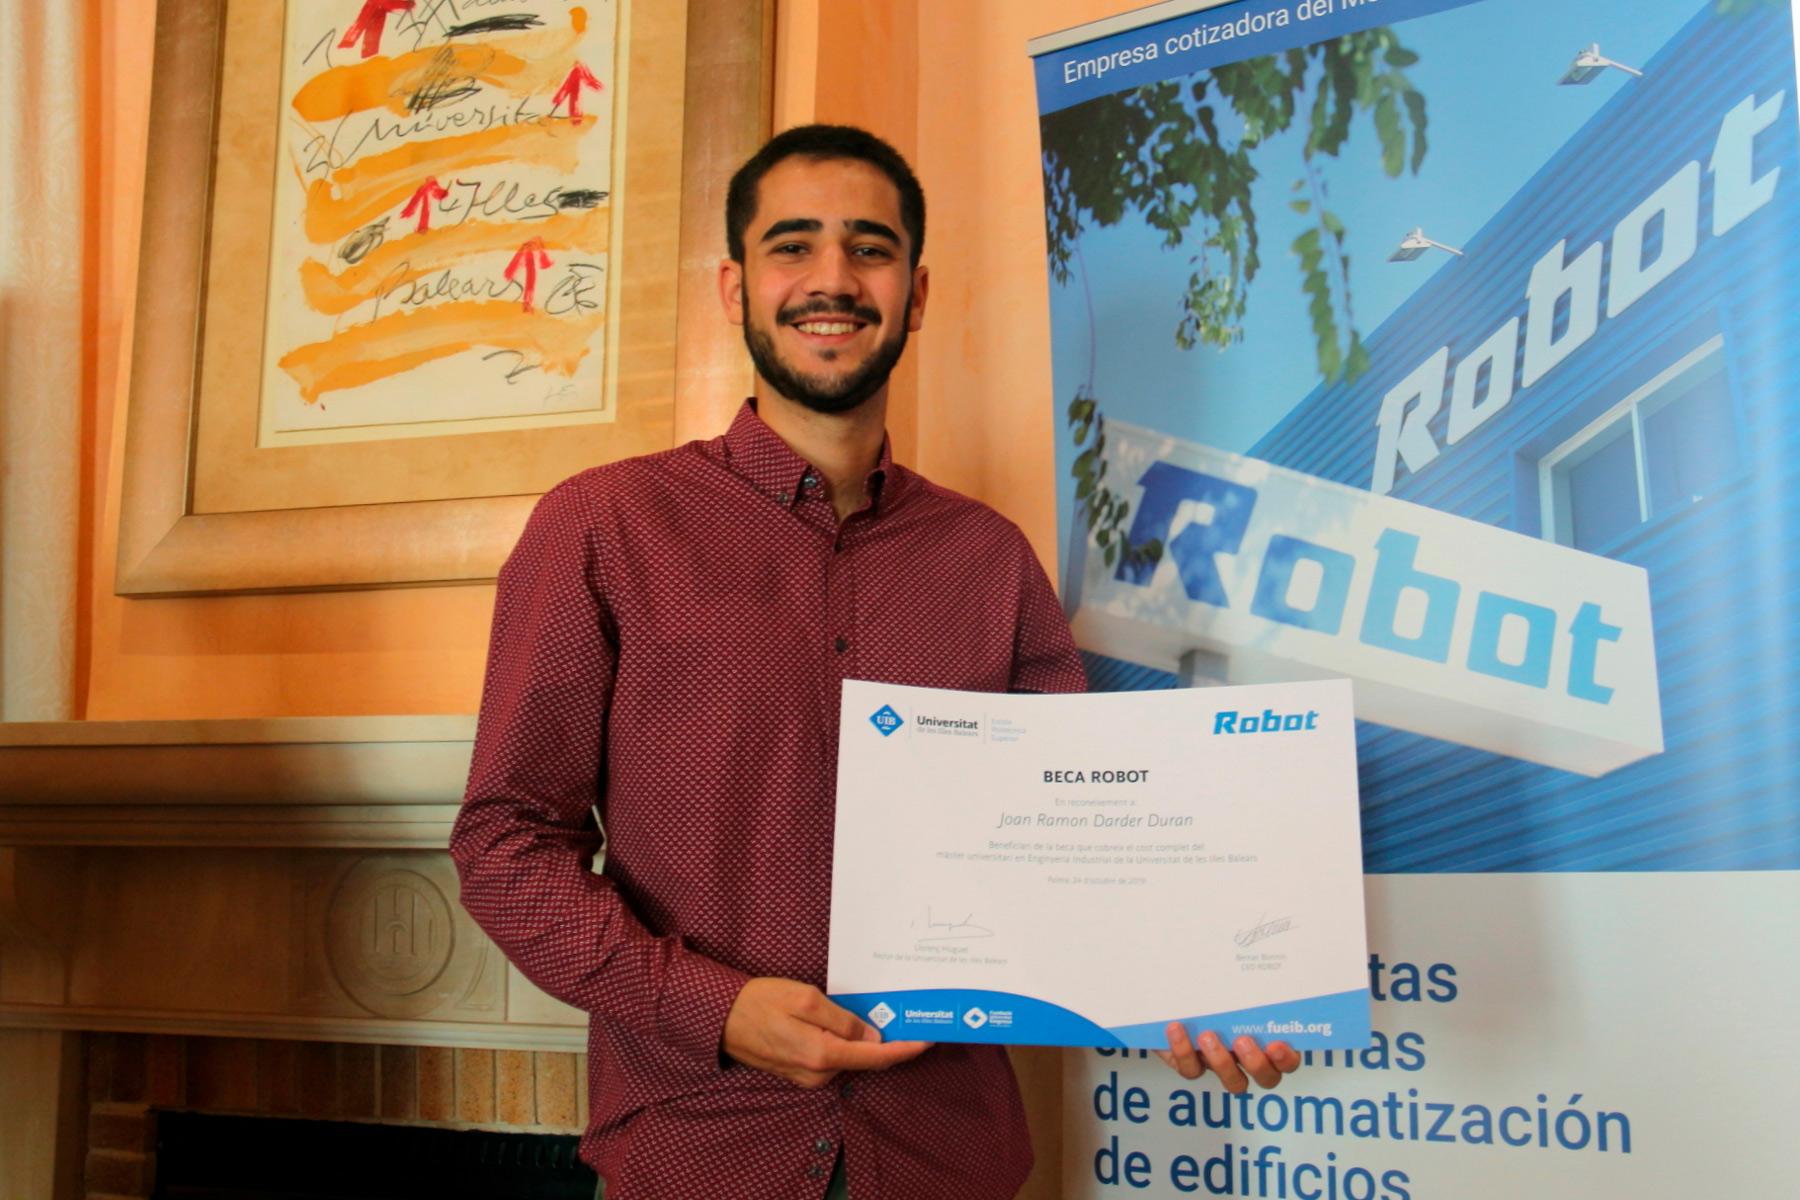 Joan Ramon Darder is the winner of Robot scholarship